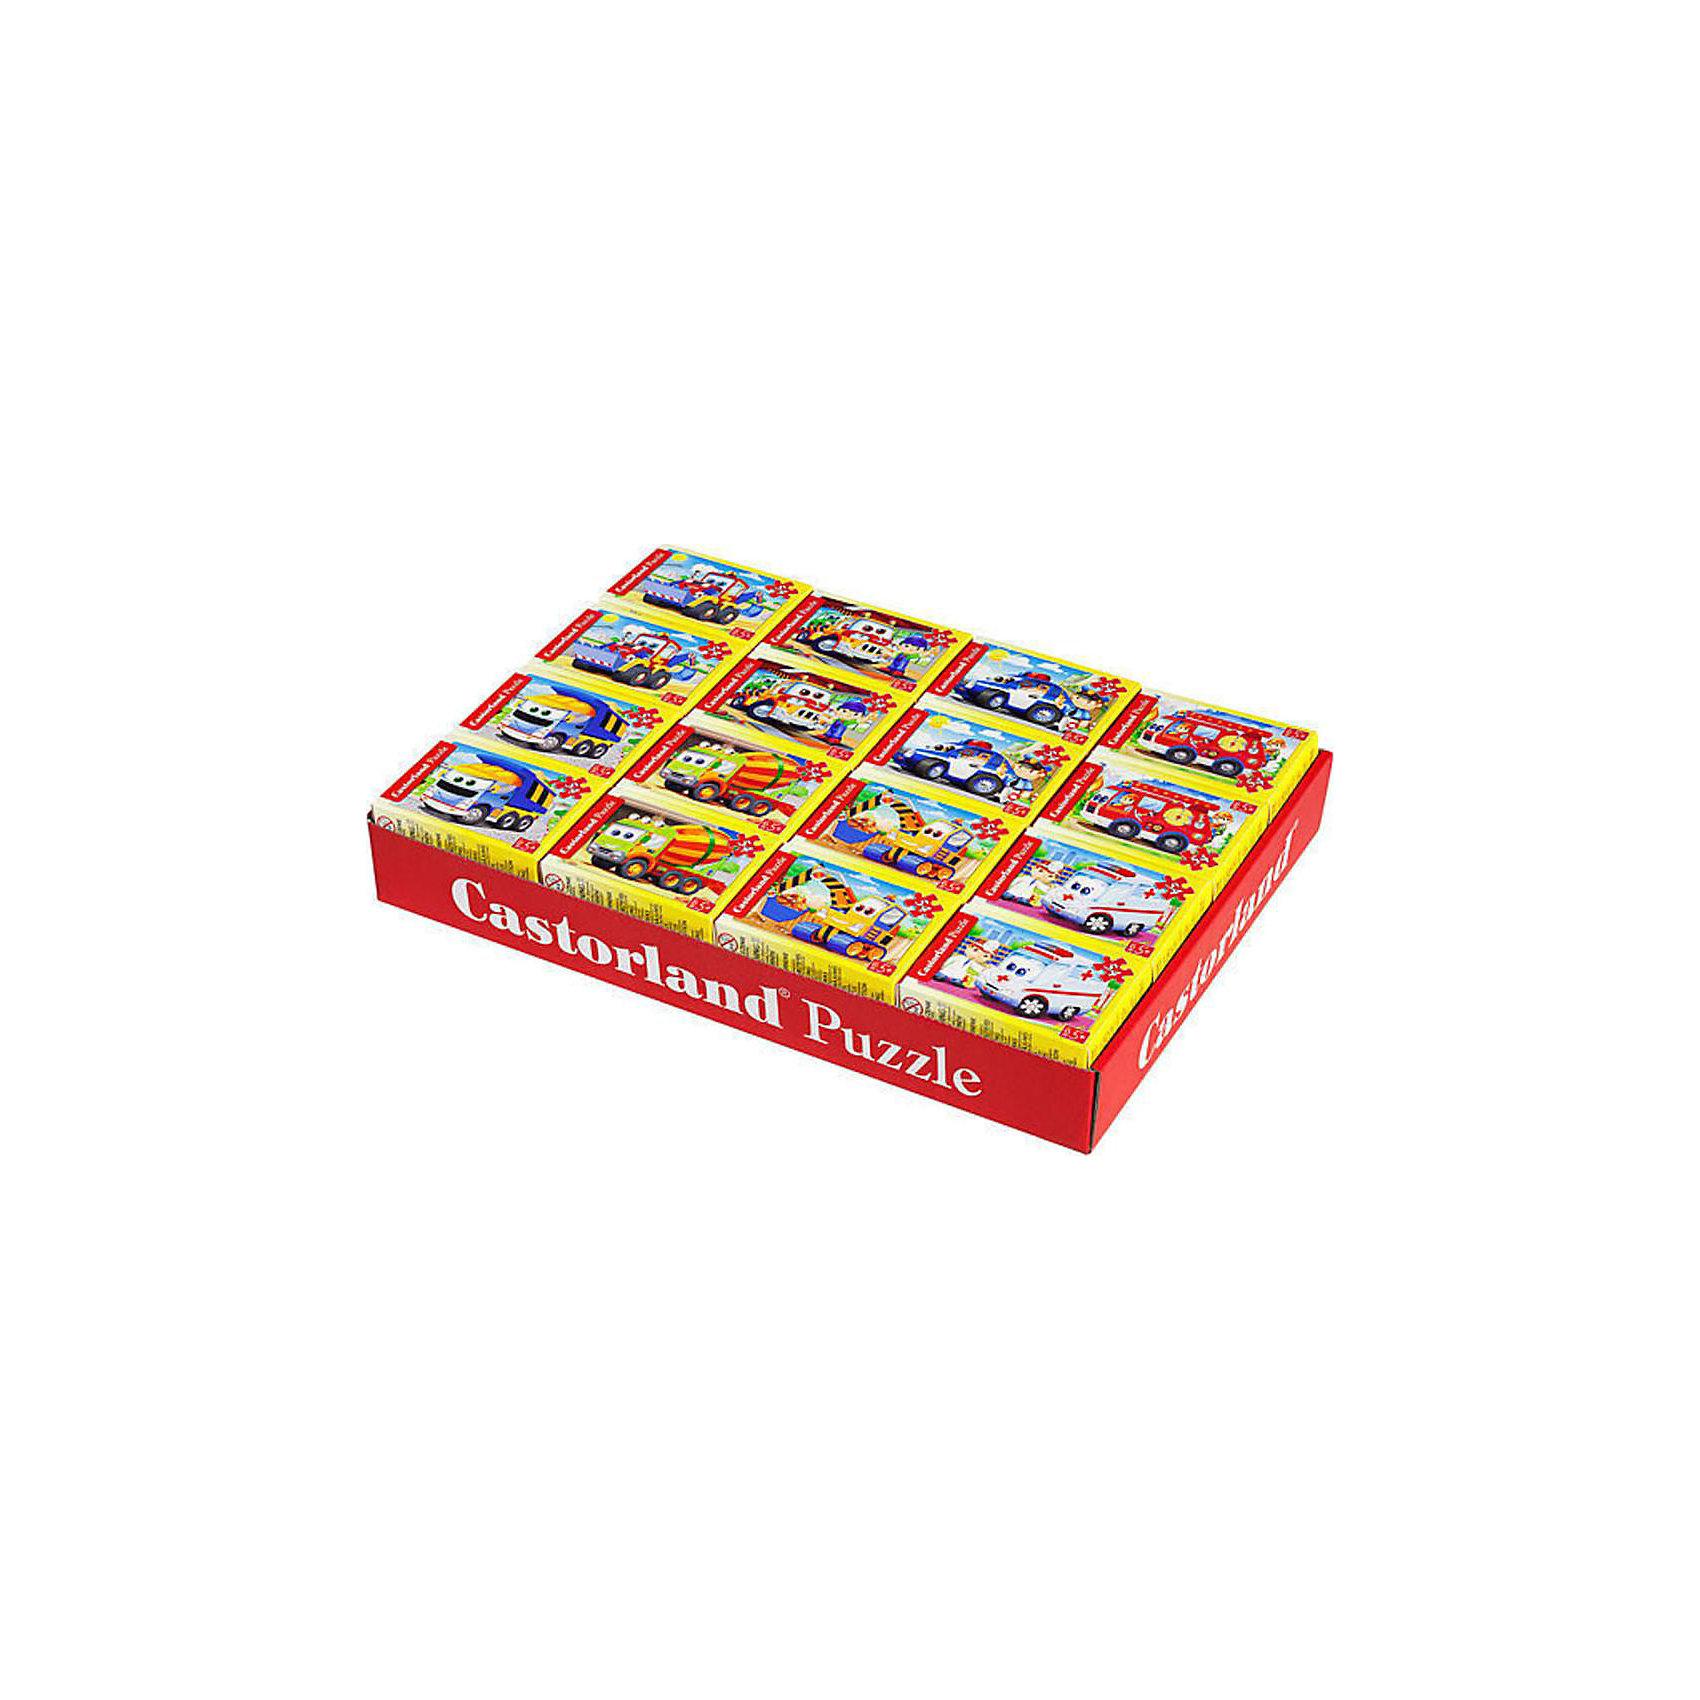 Castorland Пазлы Новый год, 54 детали Mini, Castorland, в ассорт. пазлы бомик пазлы книжка репка